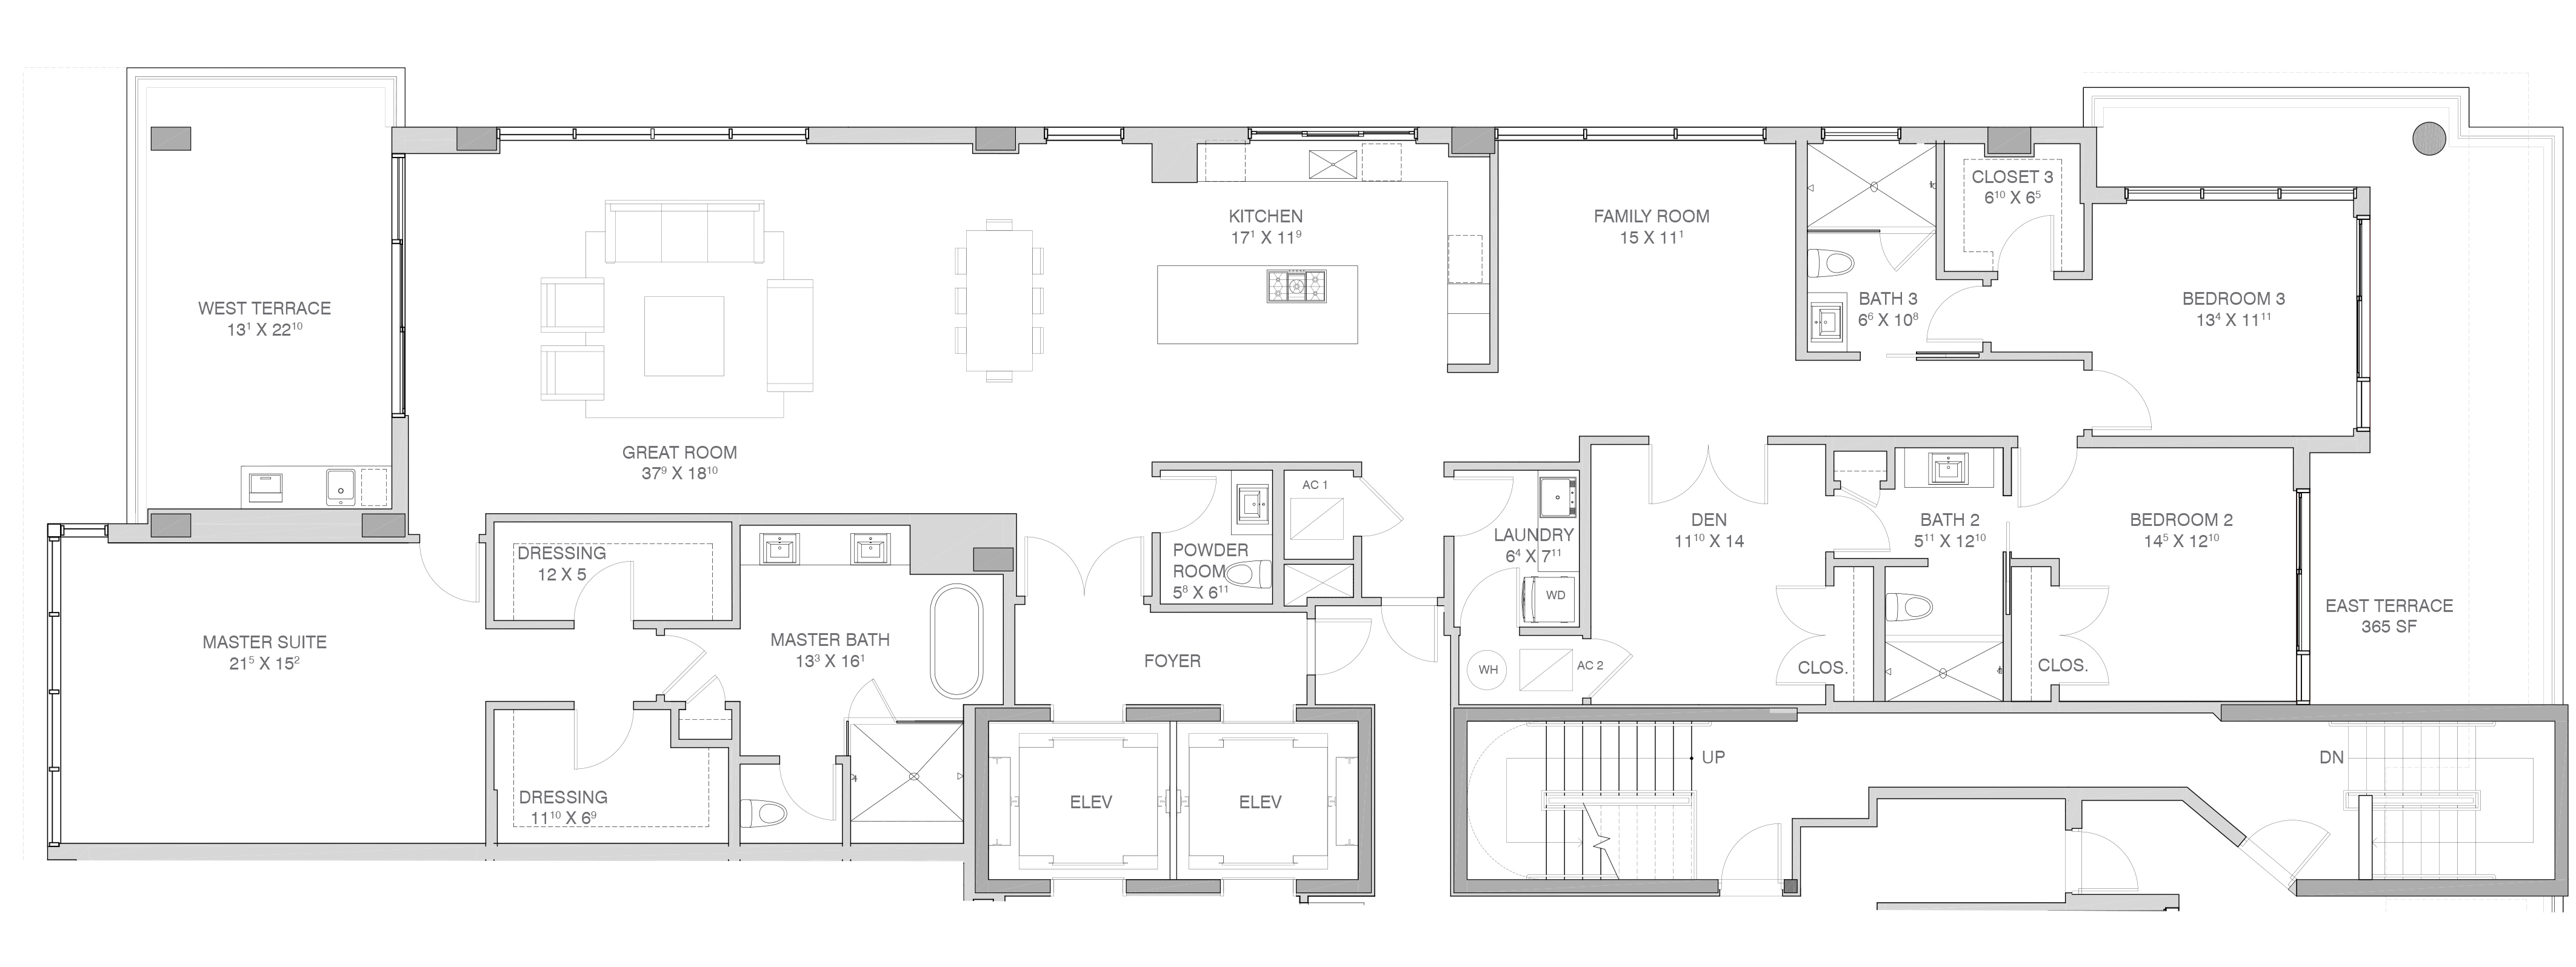 Adagio Fort Lauderdale Beach - Floorplan 8